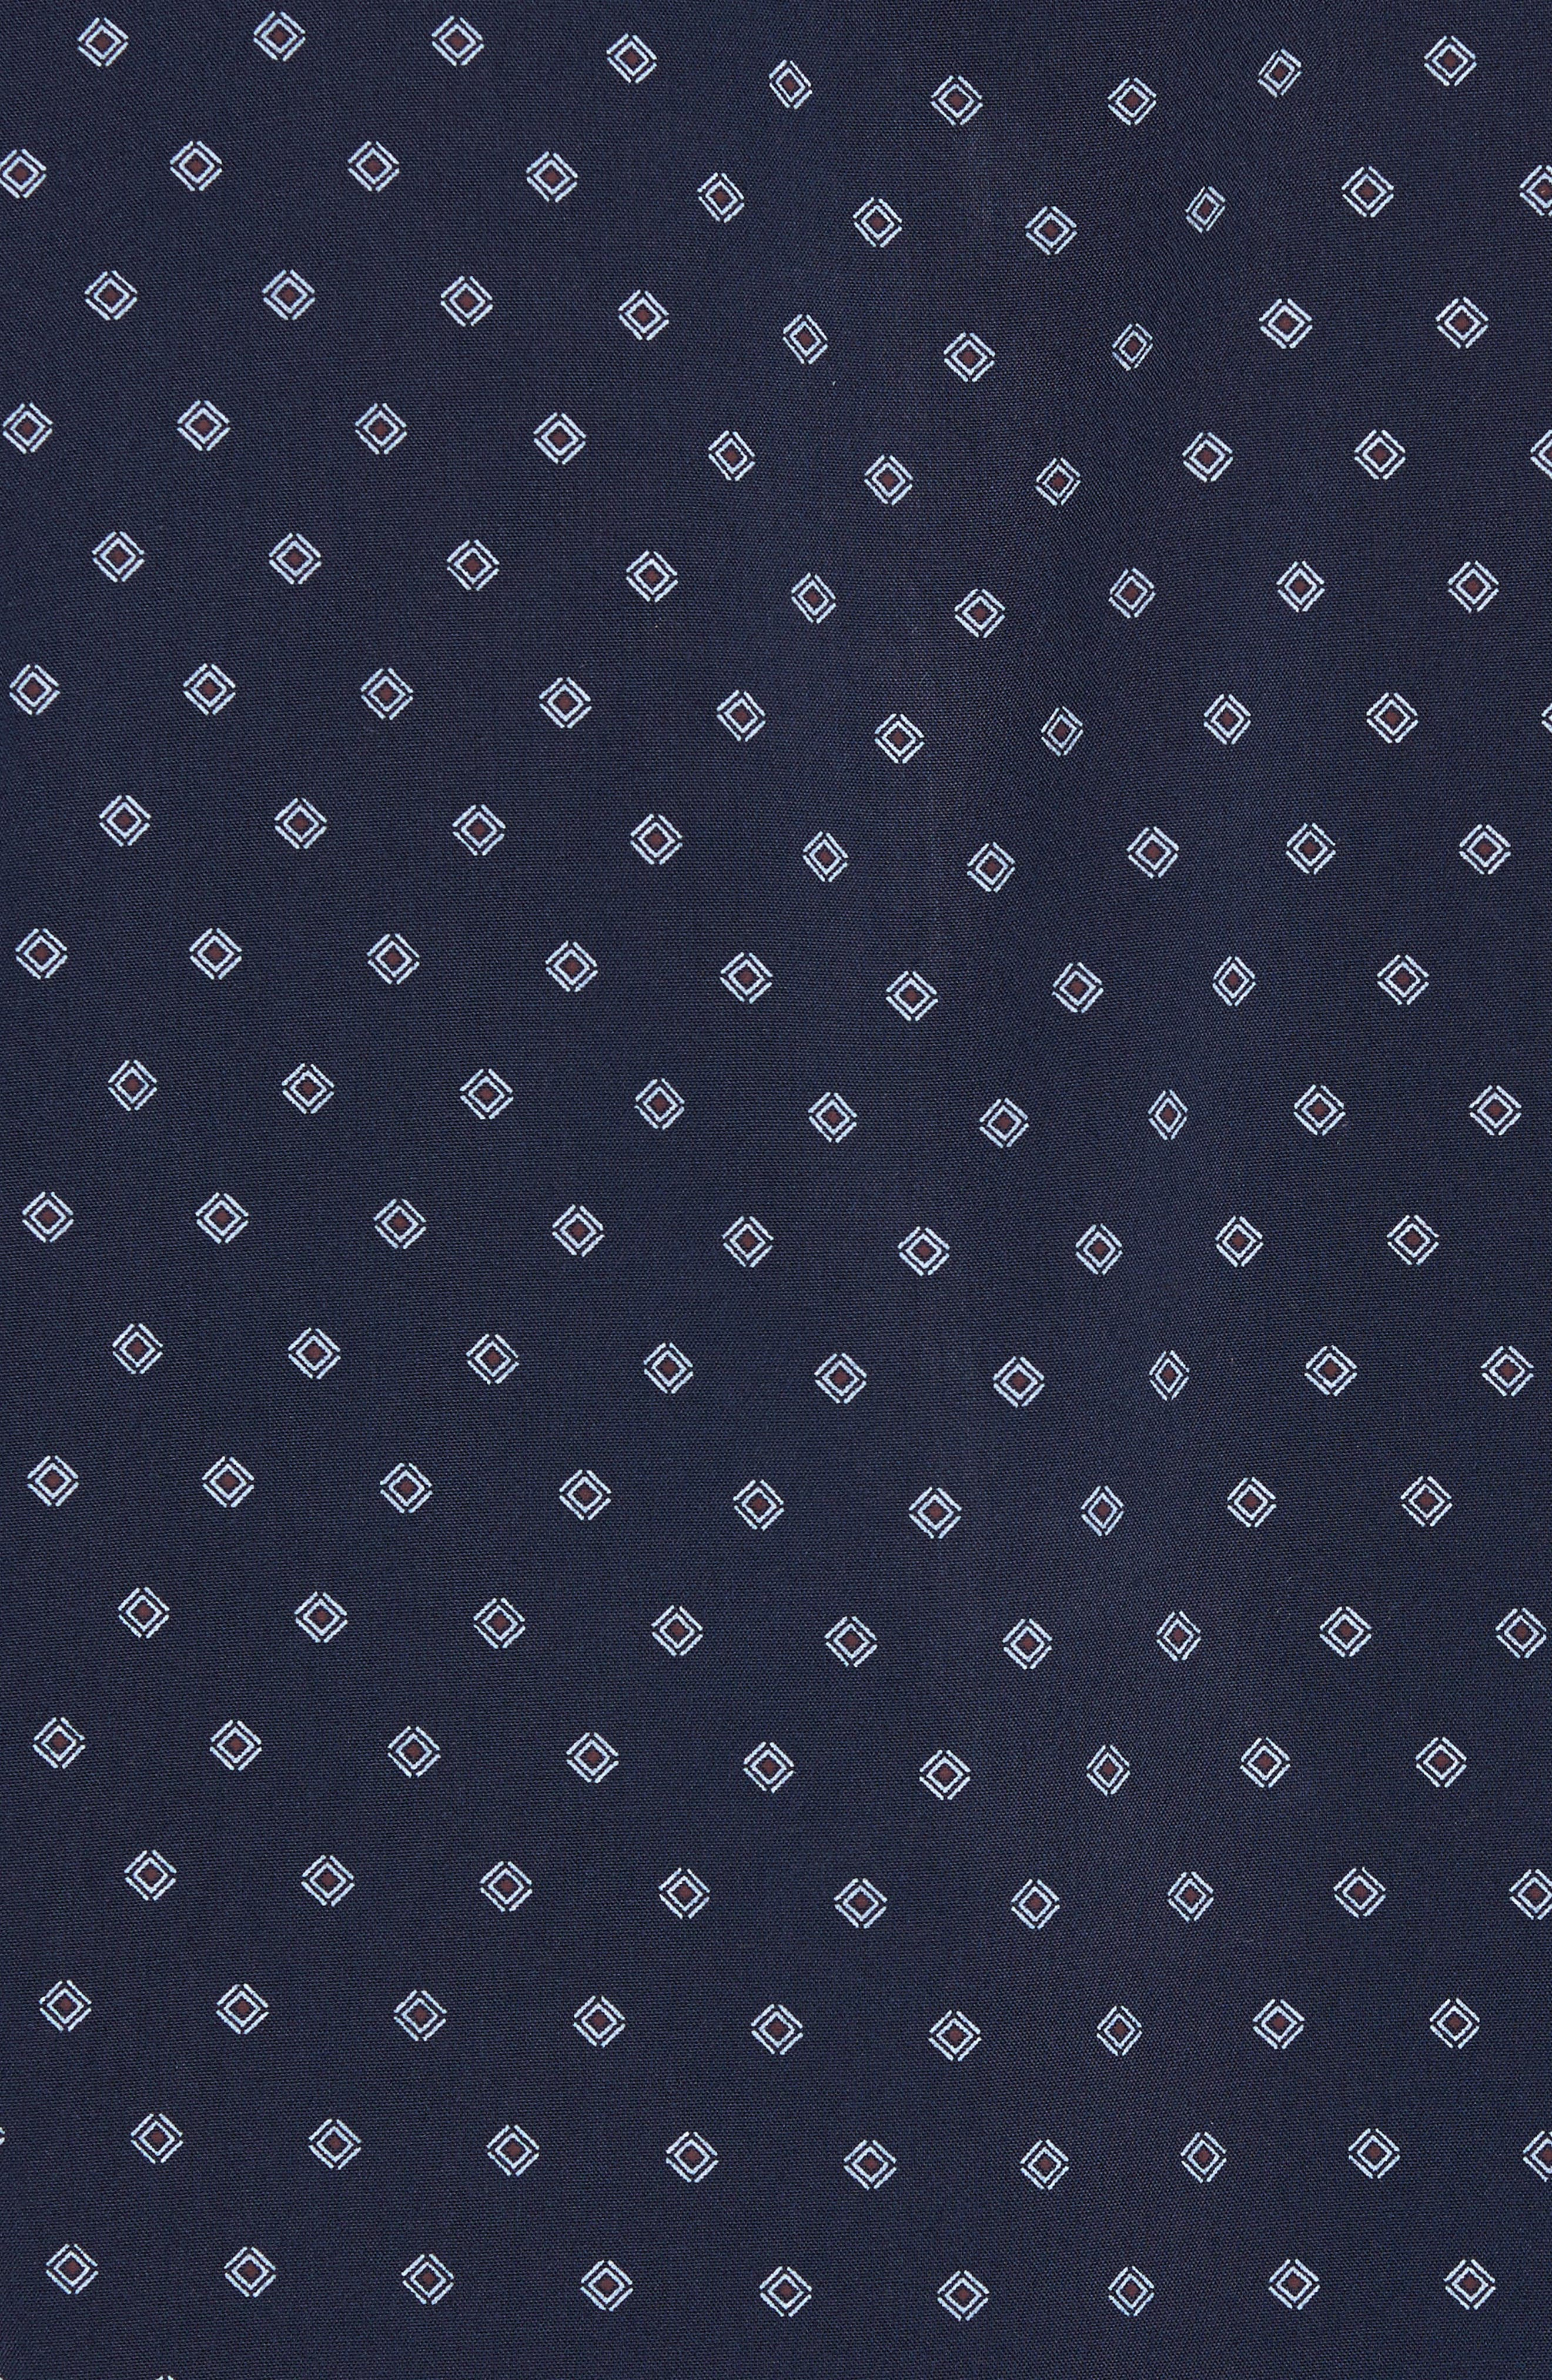 TED BAKER LONDON,                             Ilensky Micro Diamond Trim Sport Shirt,                             Alternate thumbnail 5, color,                             410